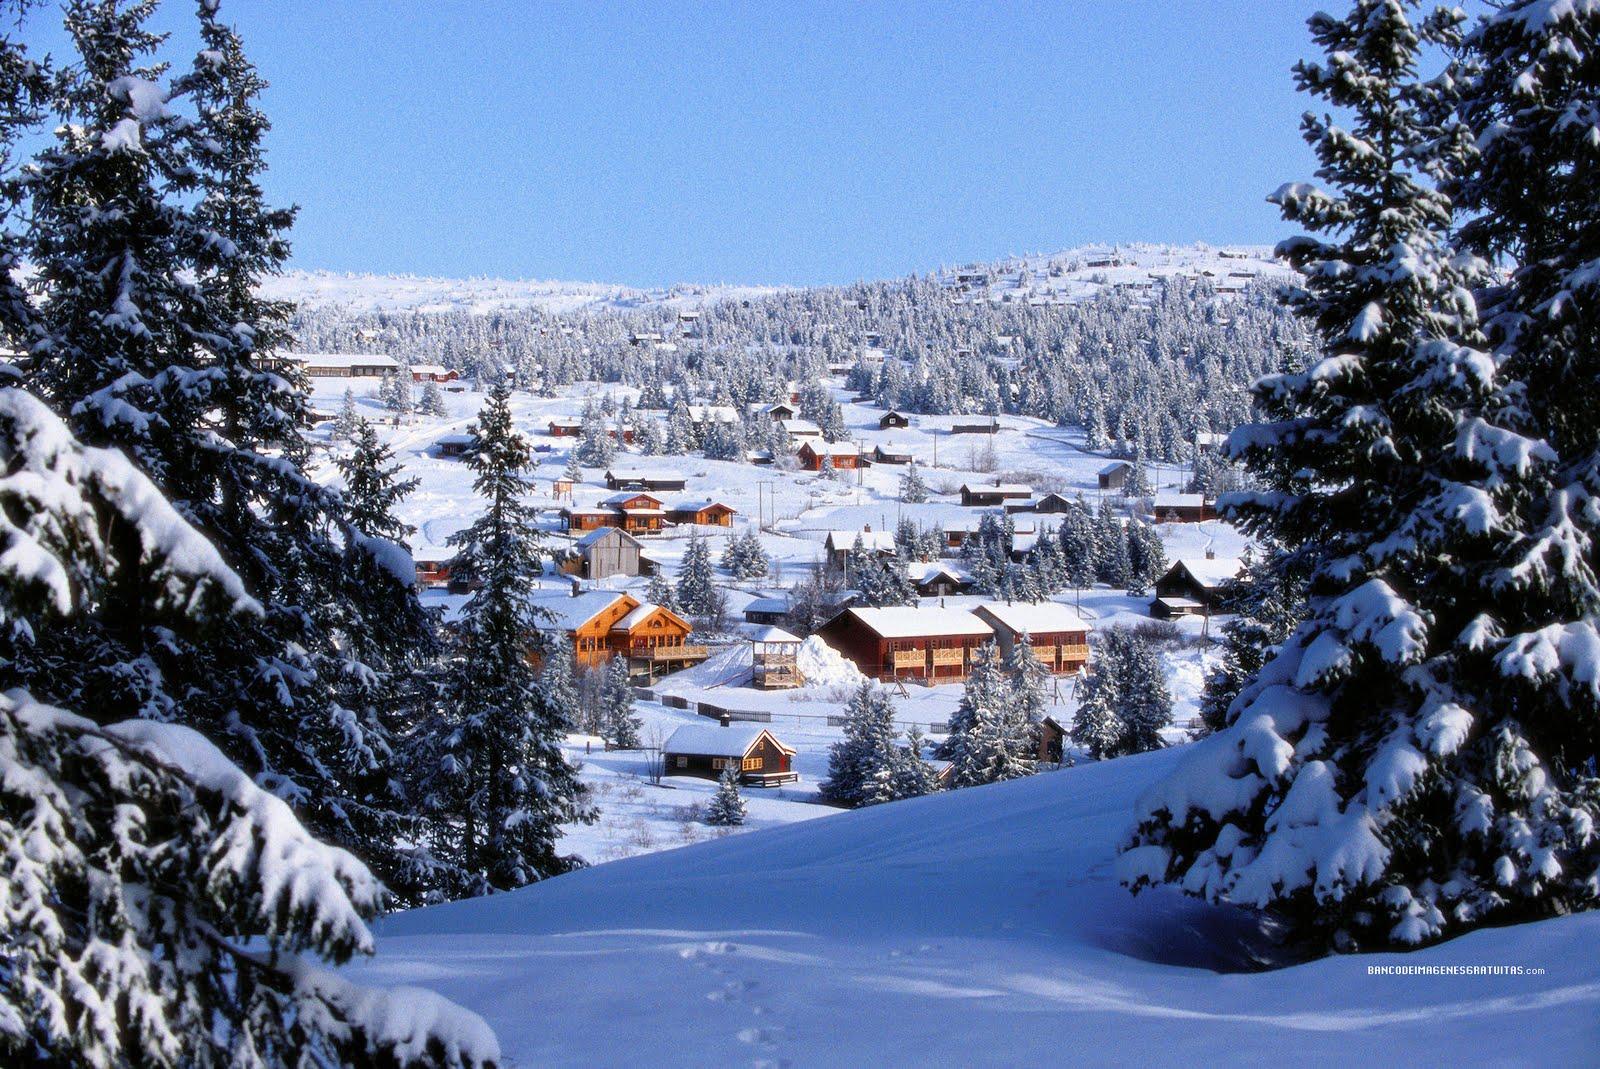 Fondo Escritorio Bonitas Montañas Nevadas: BANCO DE IMÁGENES: Paisajes Nevados O Snowscapes (nieve